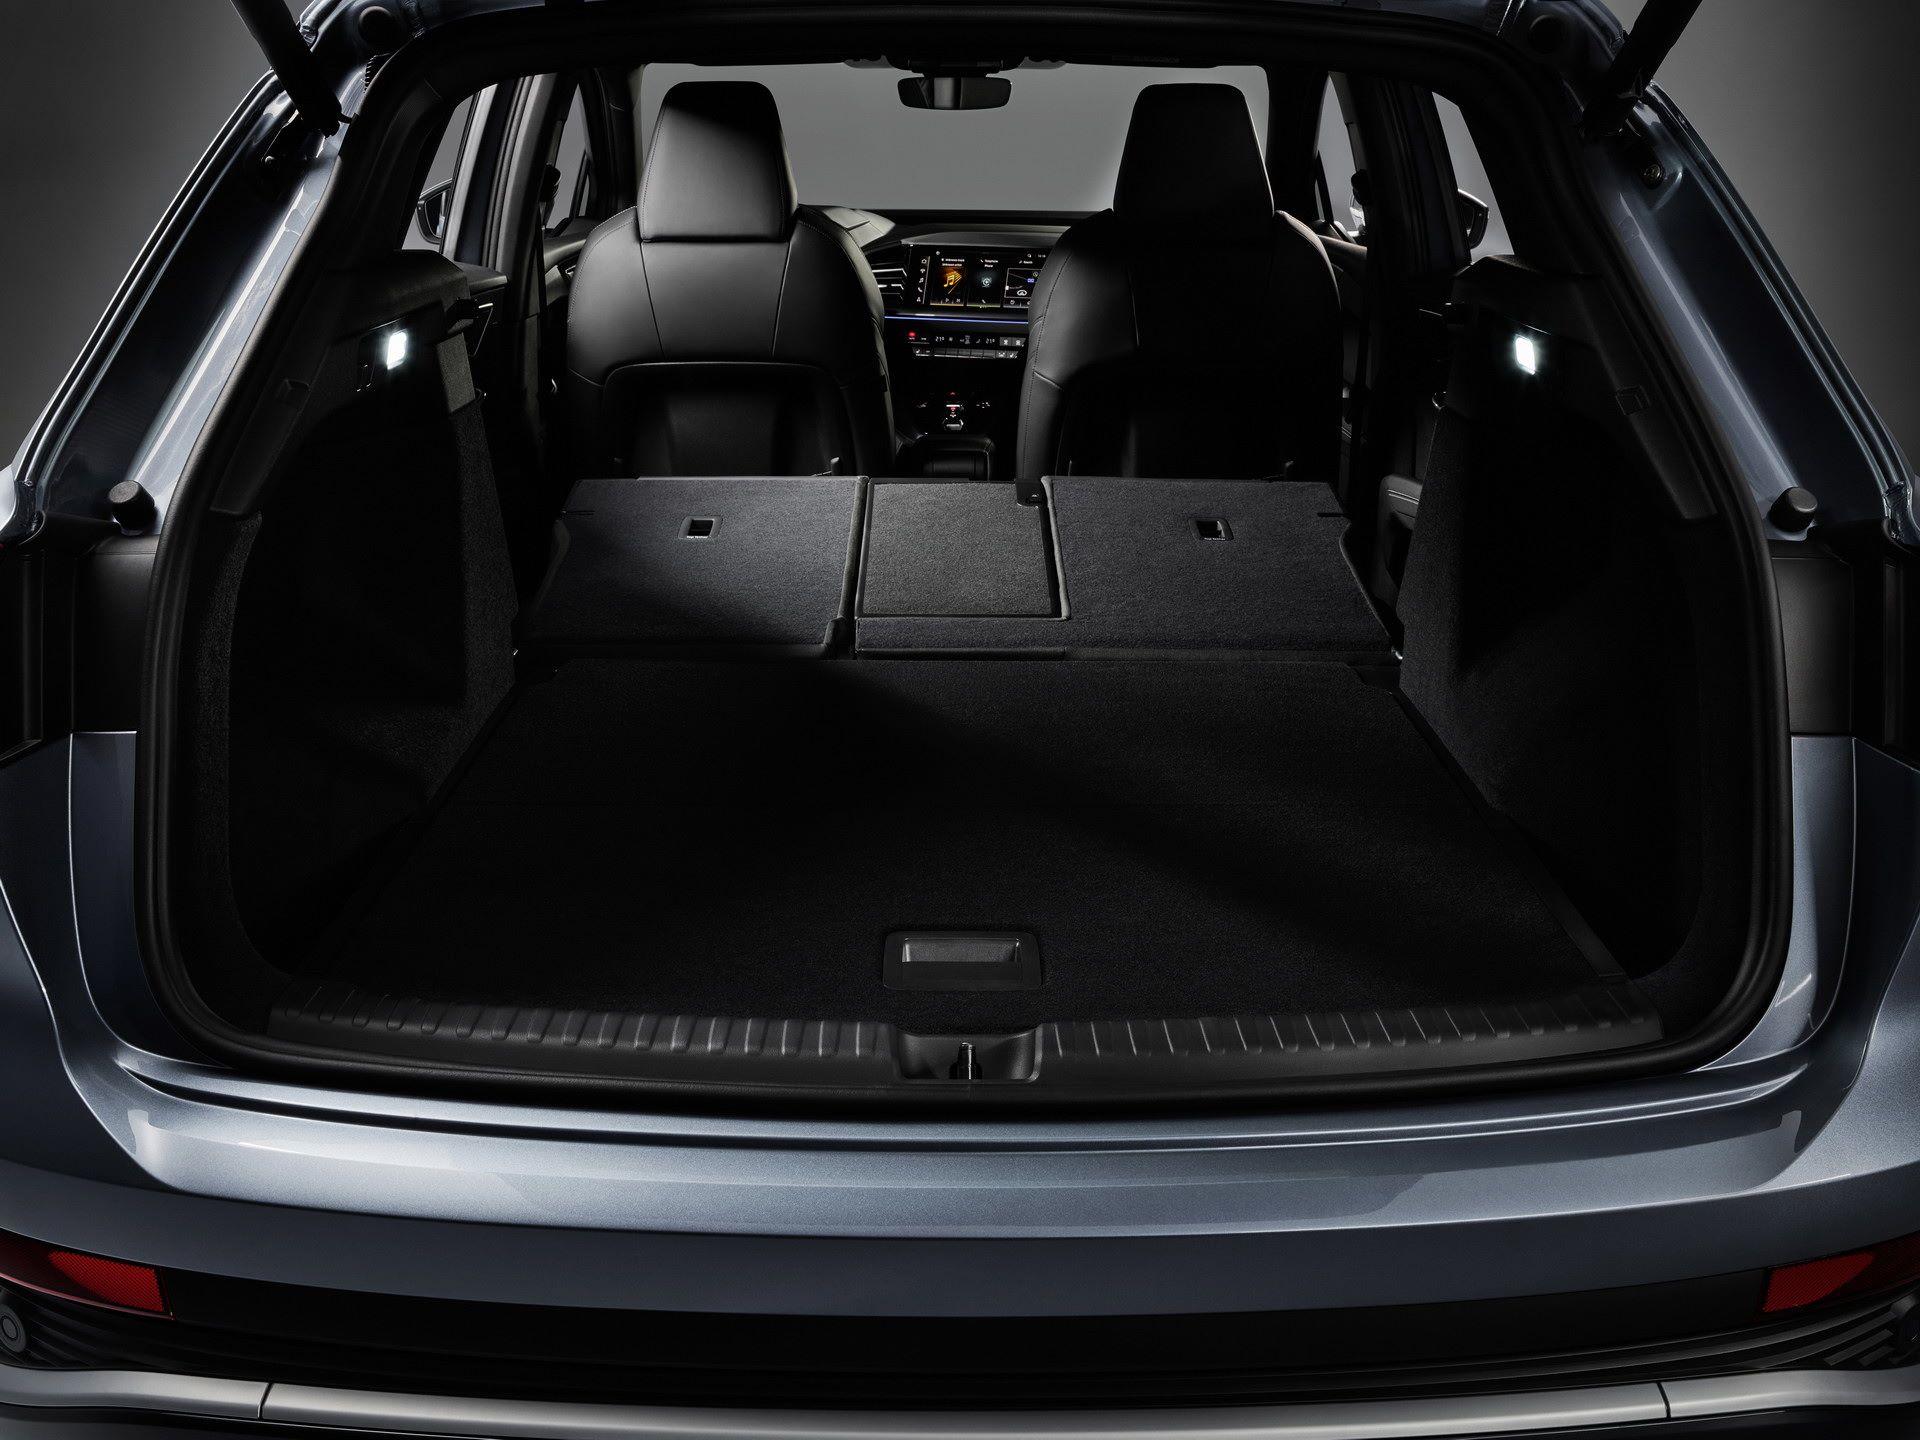 Audi-Q4-e-tron-and-Q4-e-tron-Sportback-76